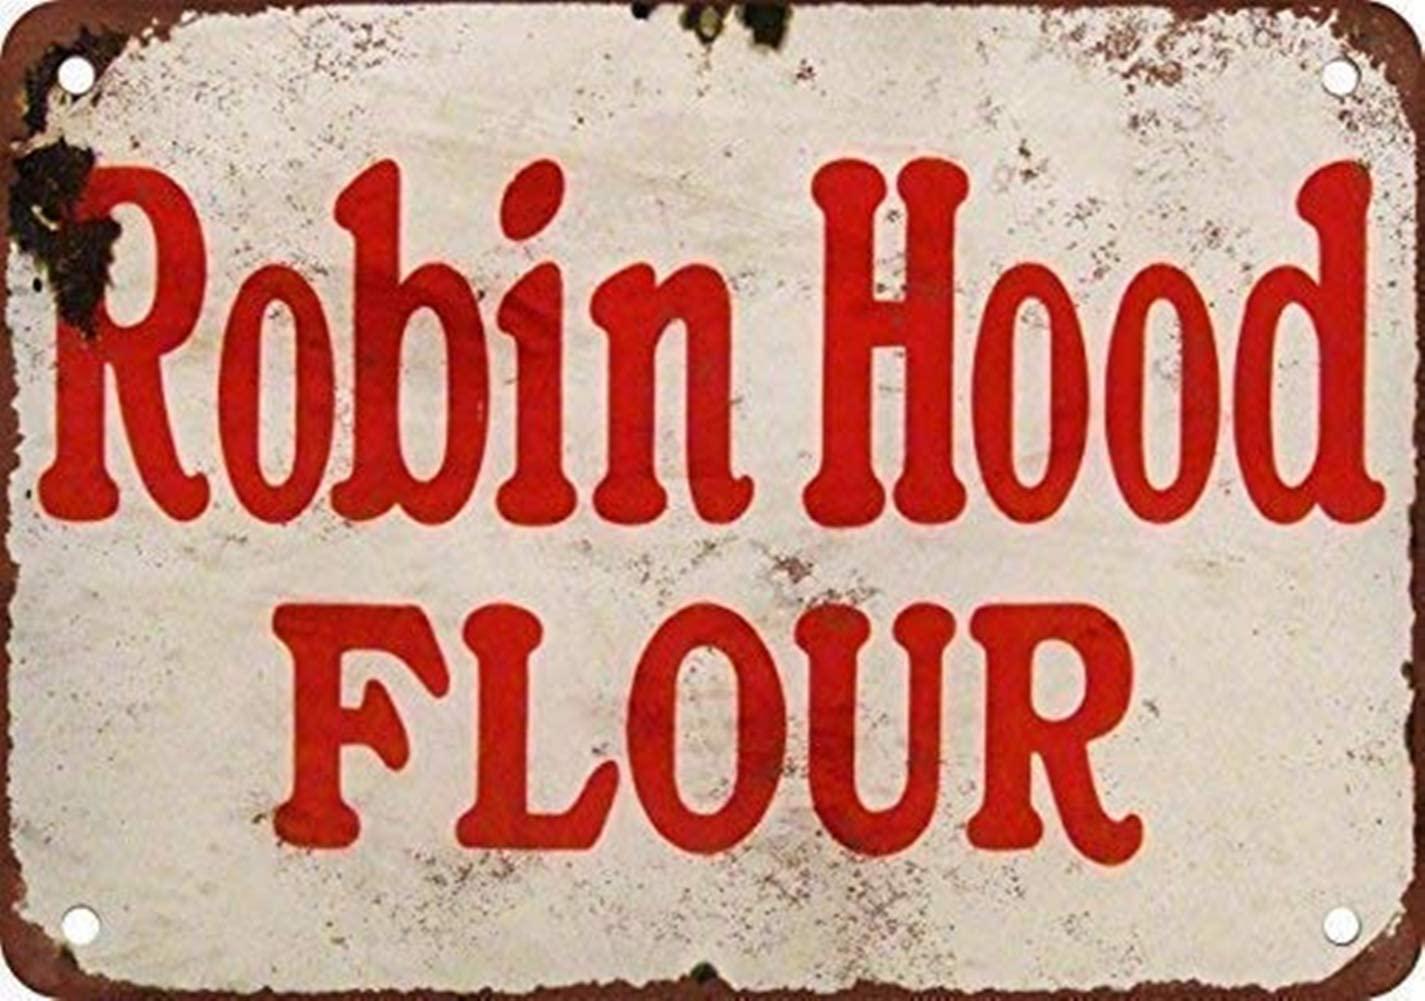 YILMEN New Tin Sign Robin Hood Flour Vintage Look Reproduction Aluminum Metal Sign 8x12 INCH (M4030)